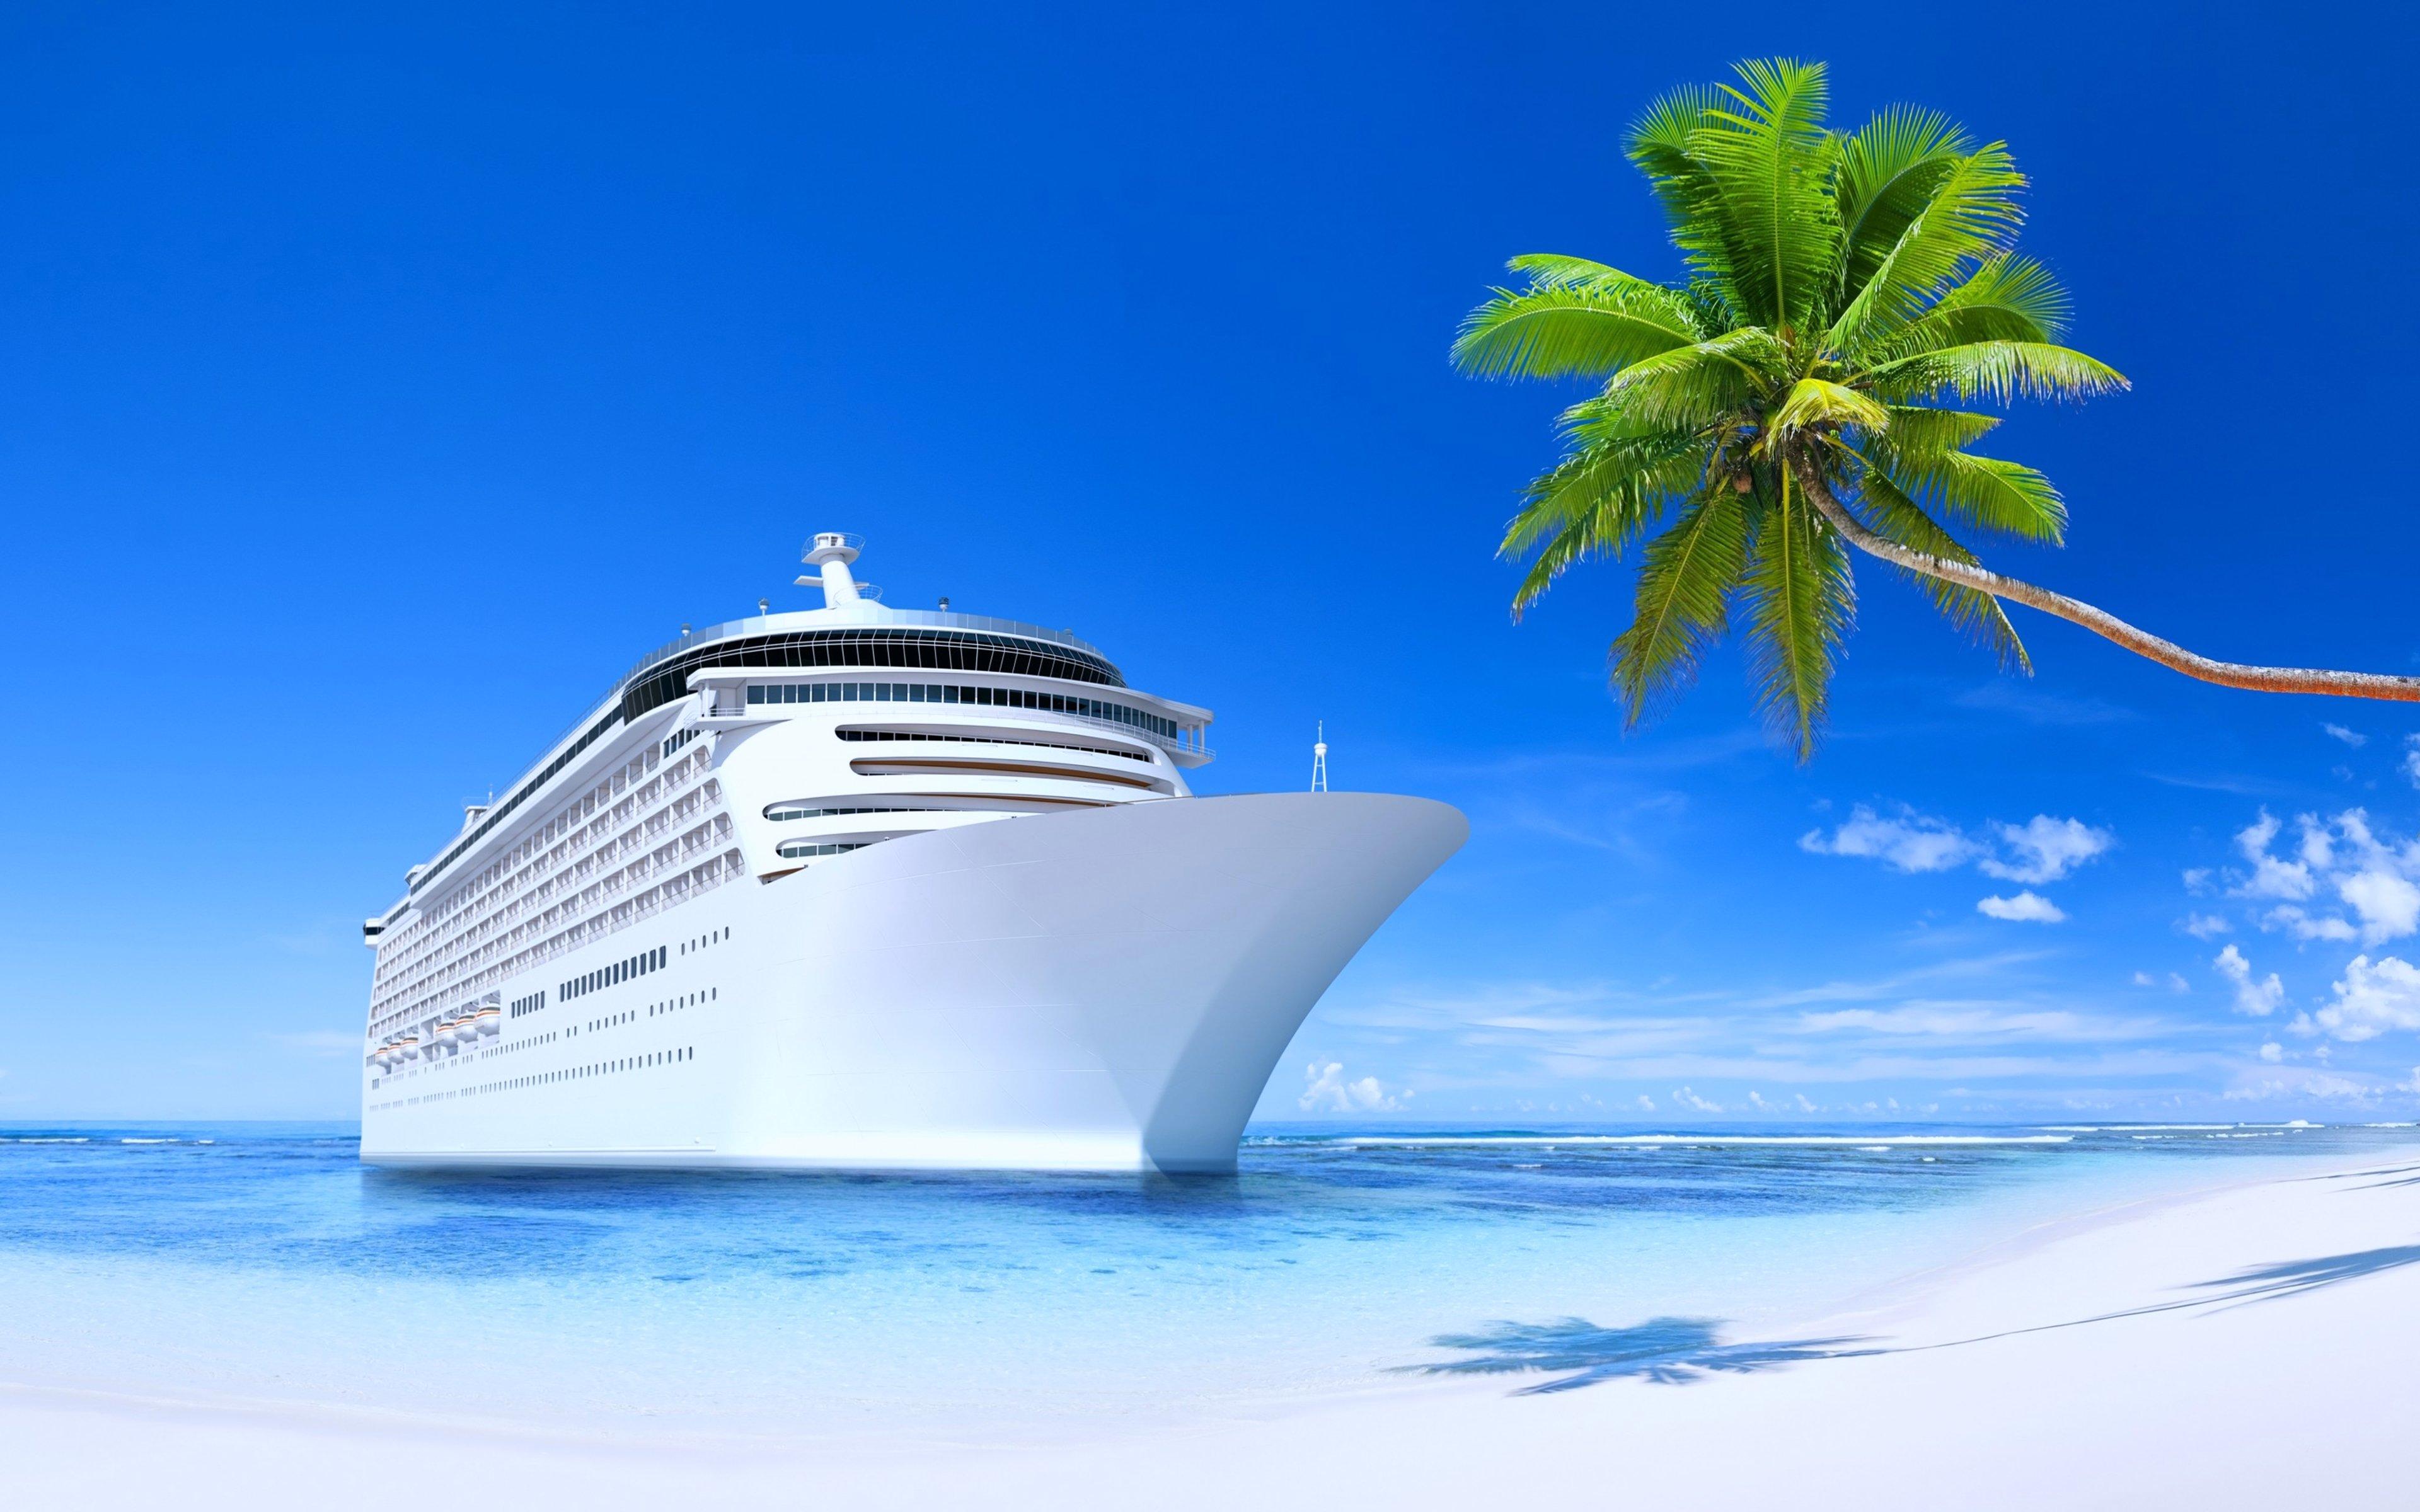 Cruise Ship Hd Wallpaper 3840x2400 Gludy